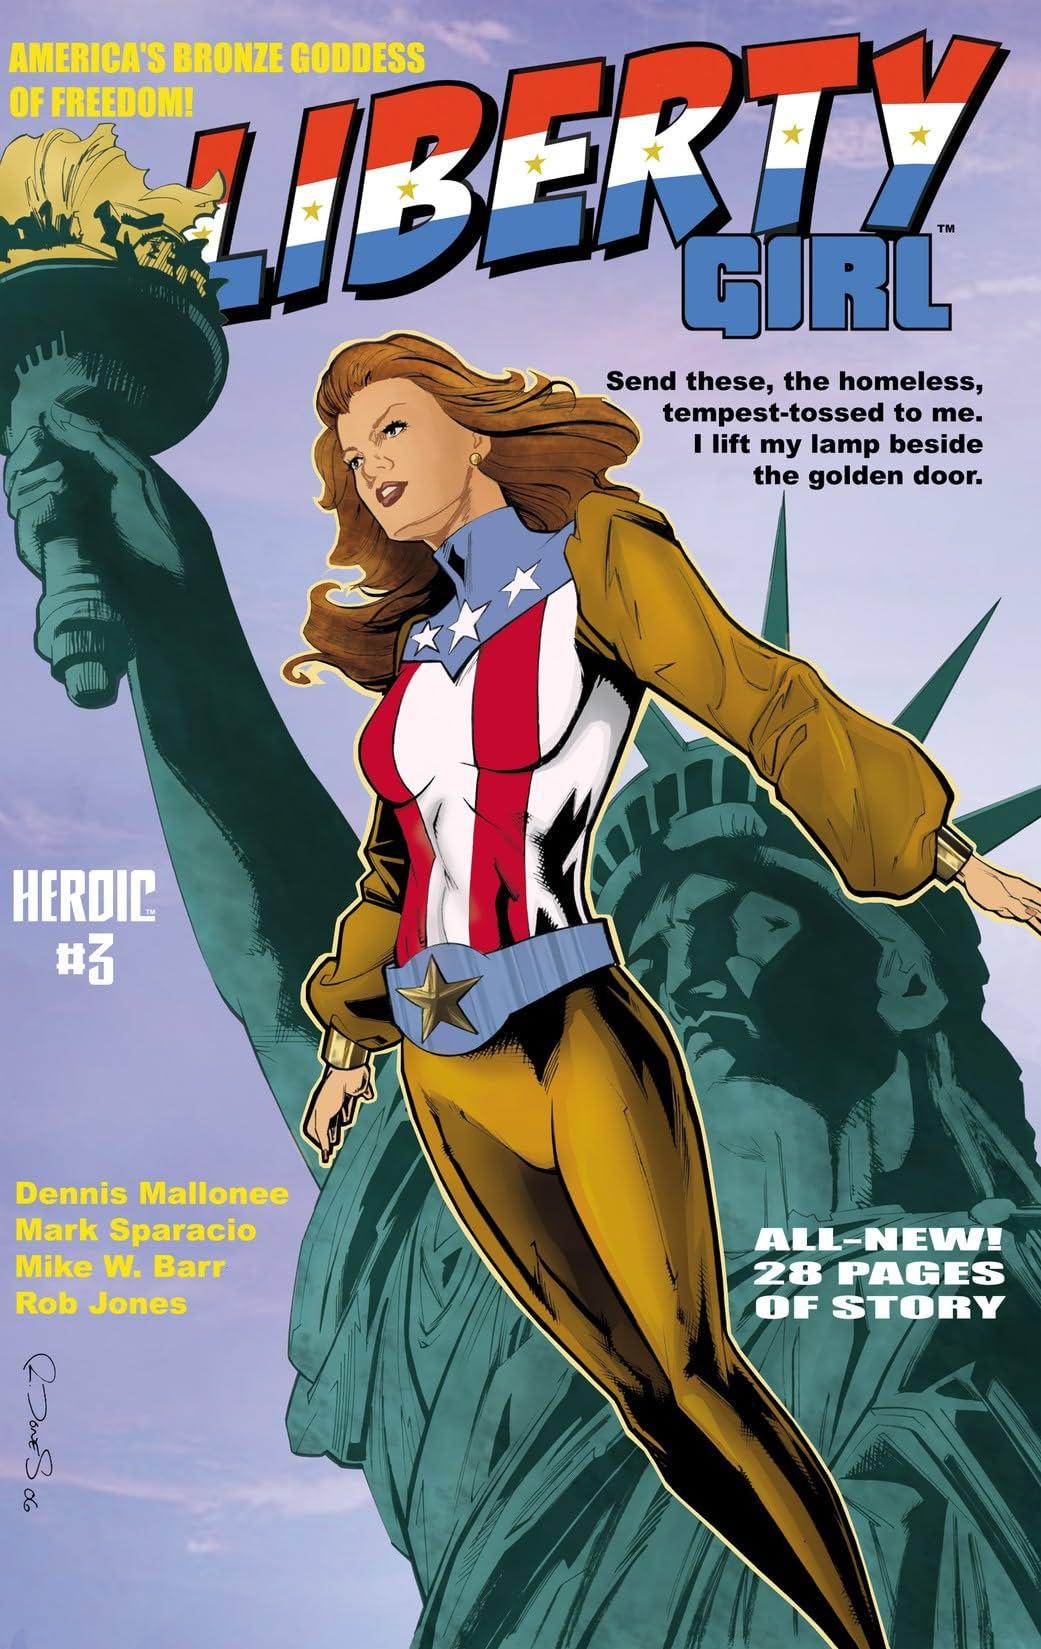 Liberty Girl #3